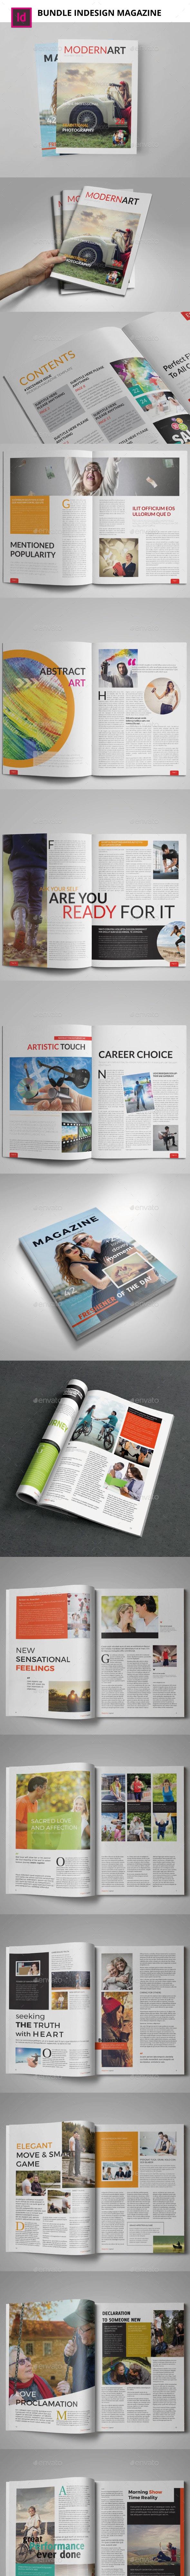 Bundle 5th Magazine Templates - Magazines Print Templates